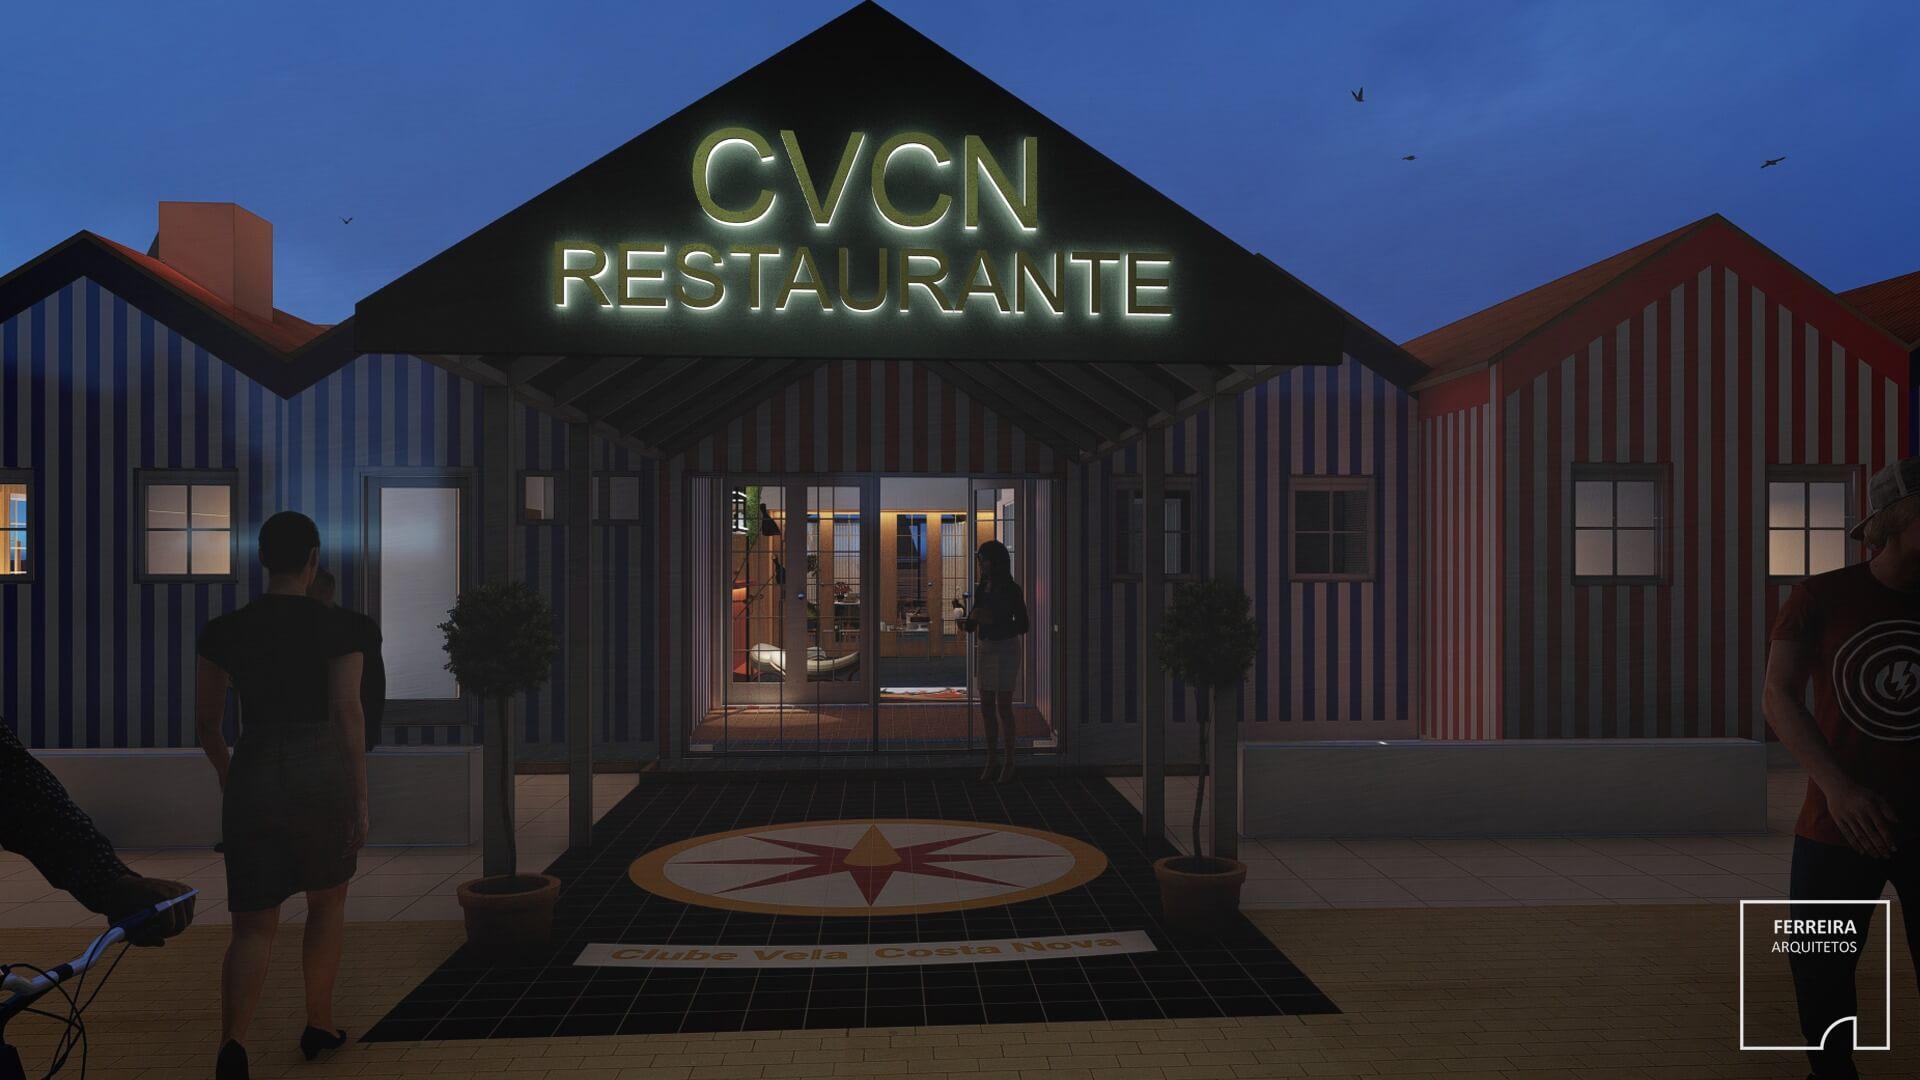 Restaurante CVCN | Anteprojeto